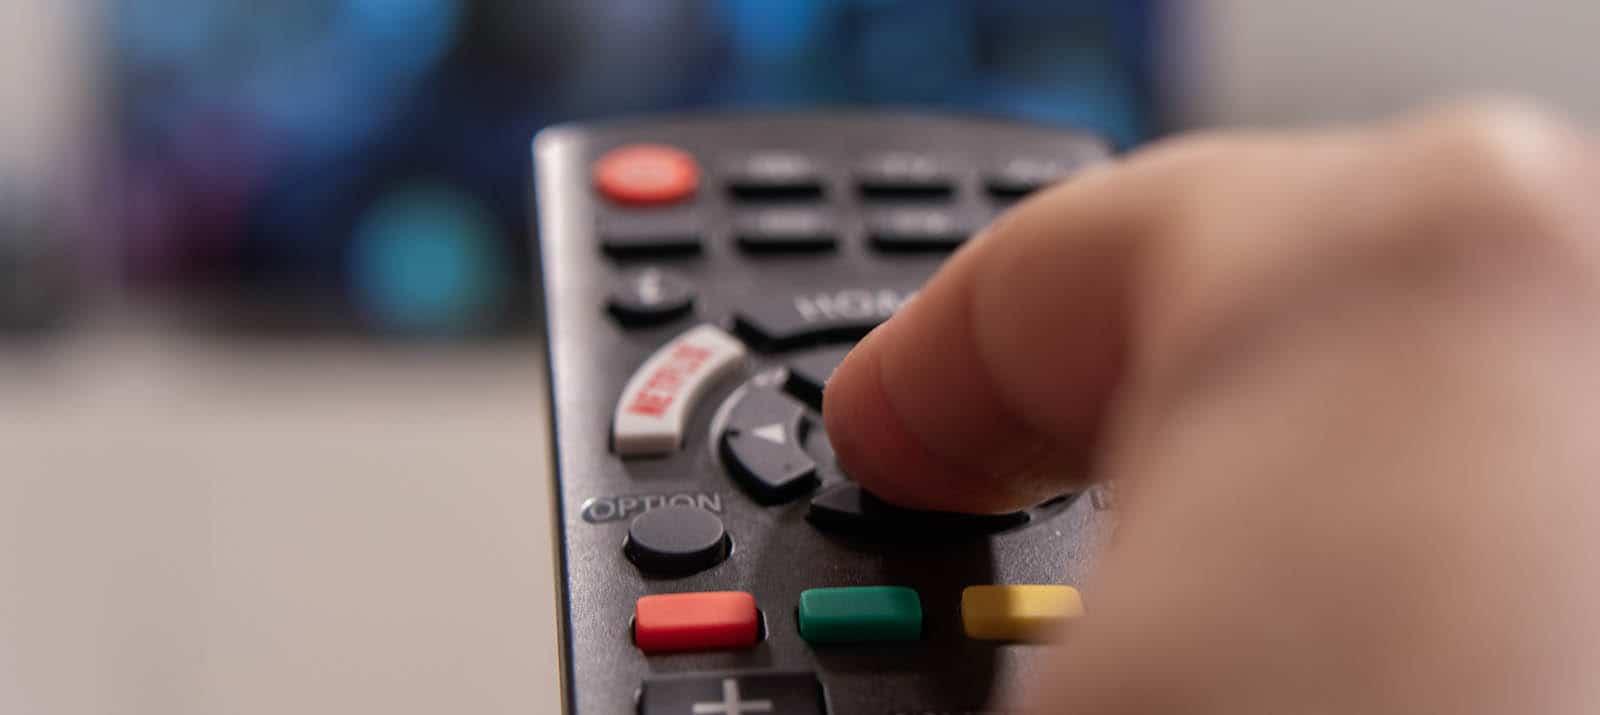 4 marketing channels